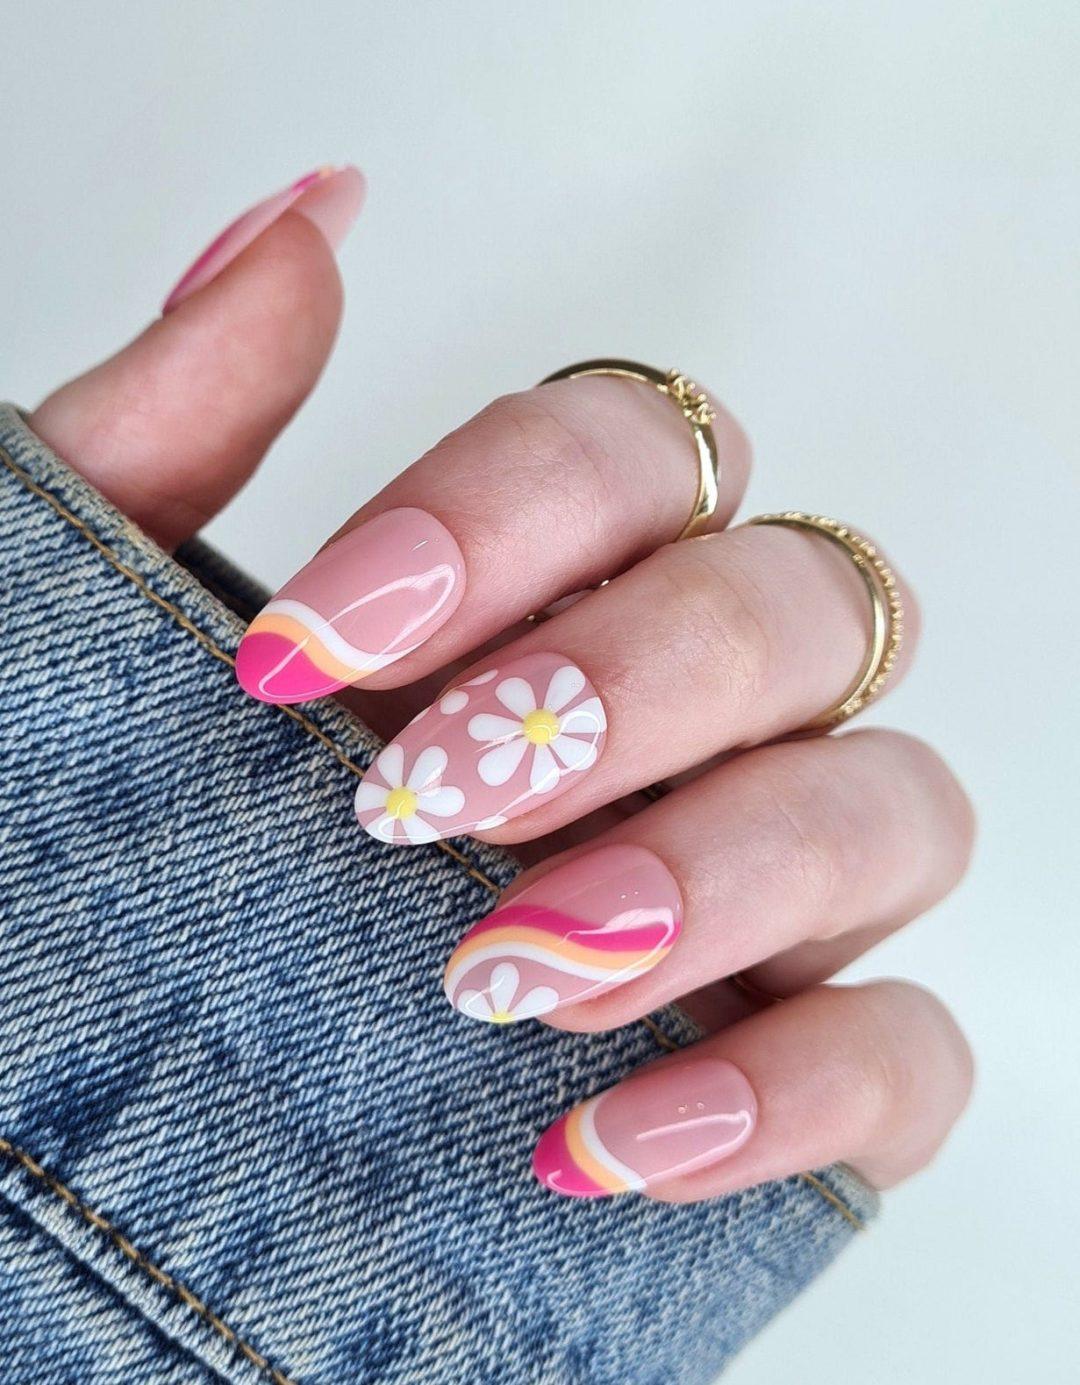 70s retro nails with daisy flowers